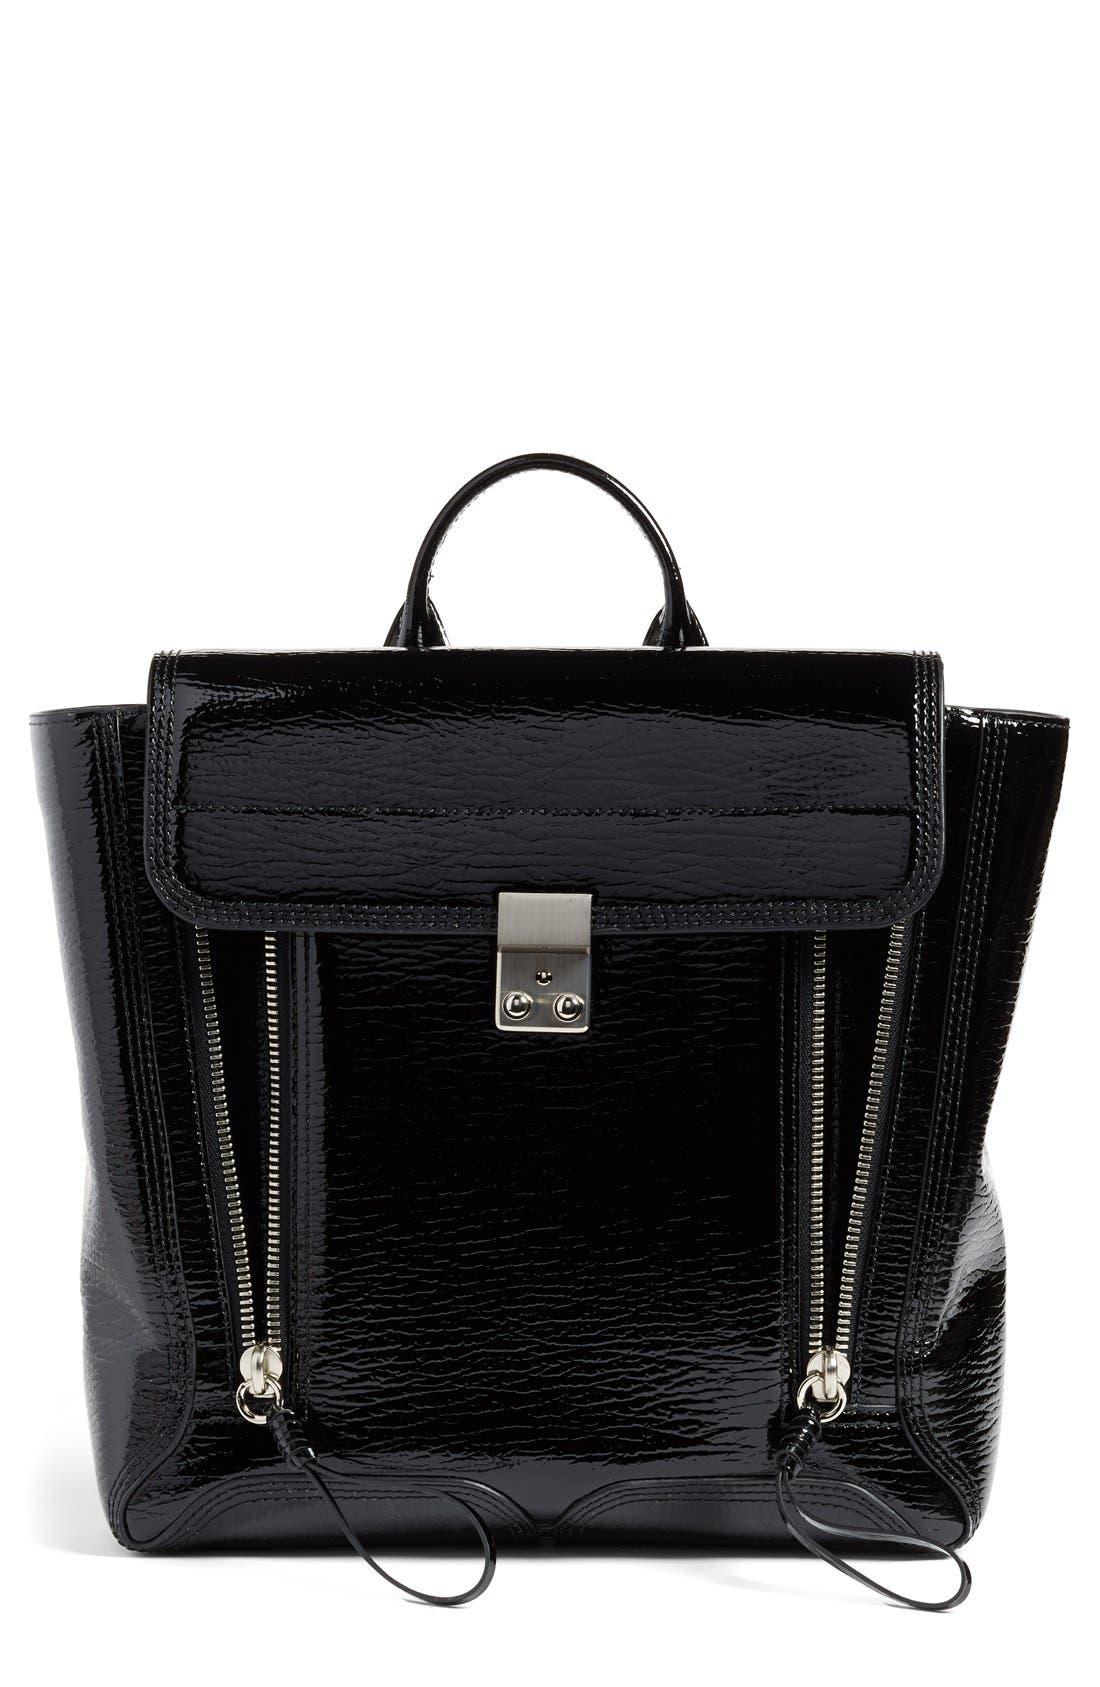 3.1 PHILLIP LIM 'Pashli' Leather Backpack